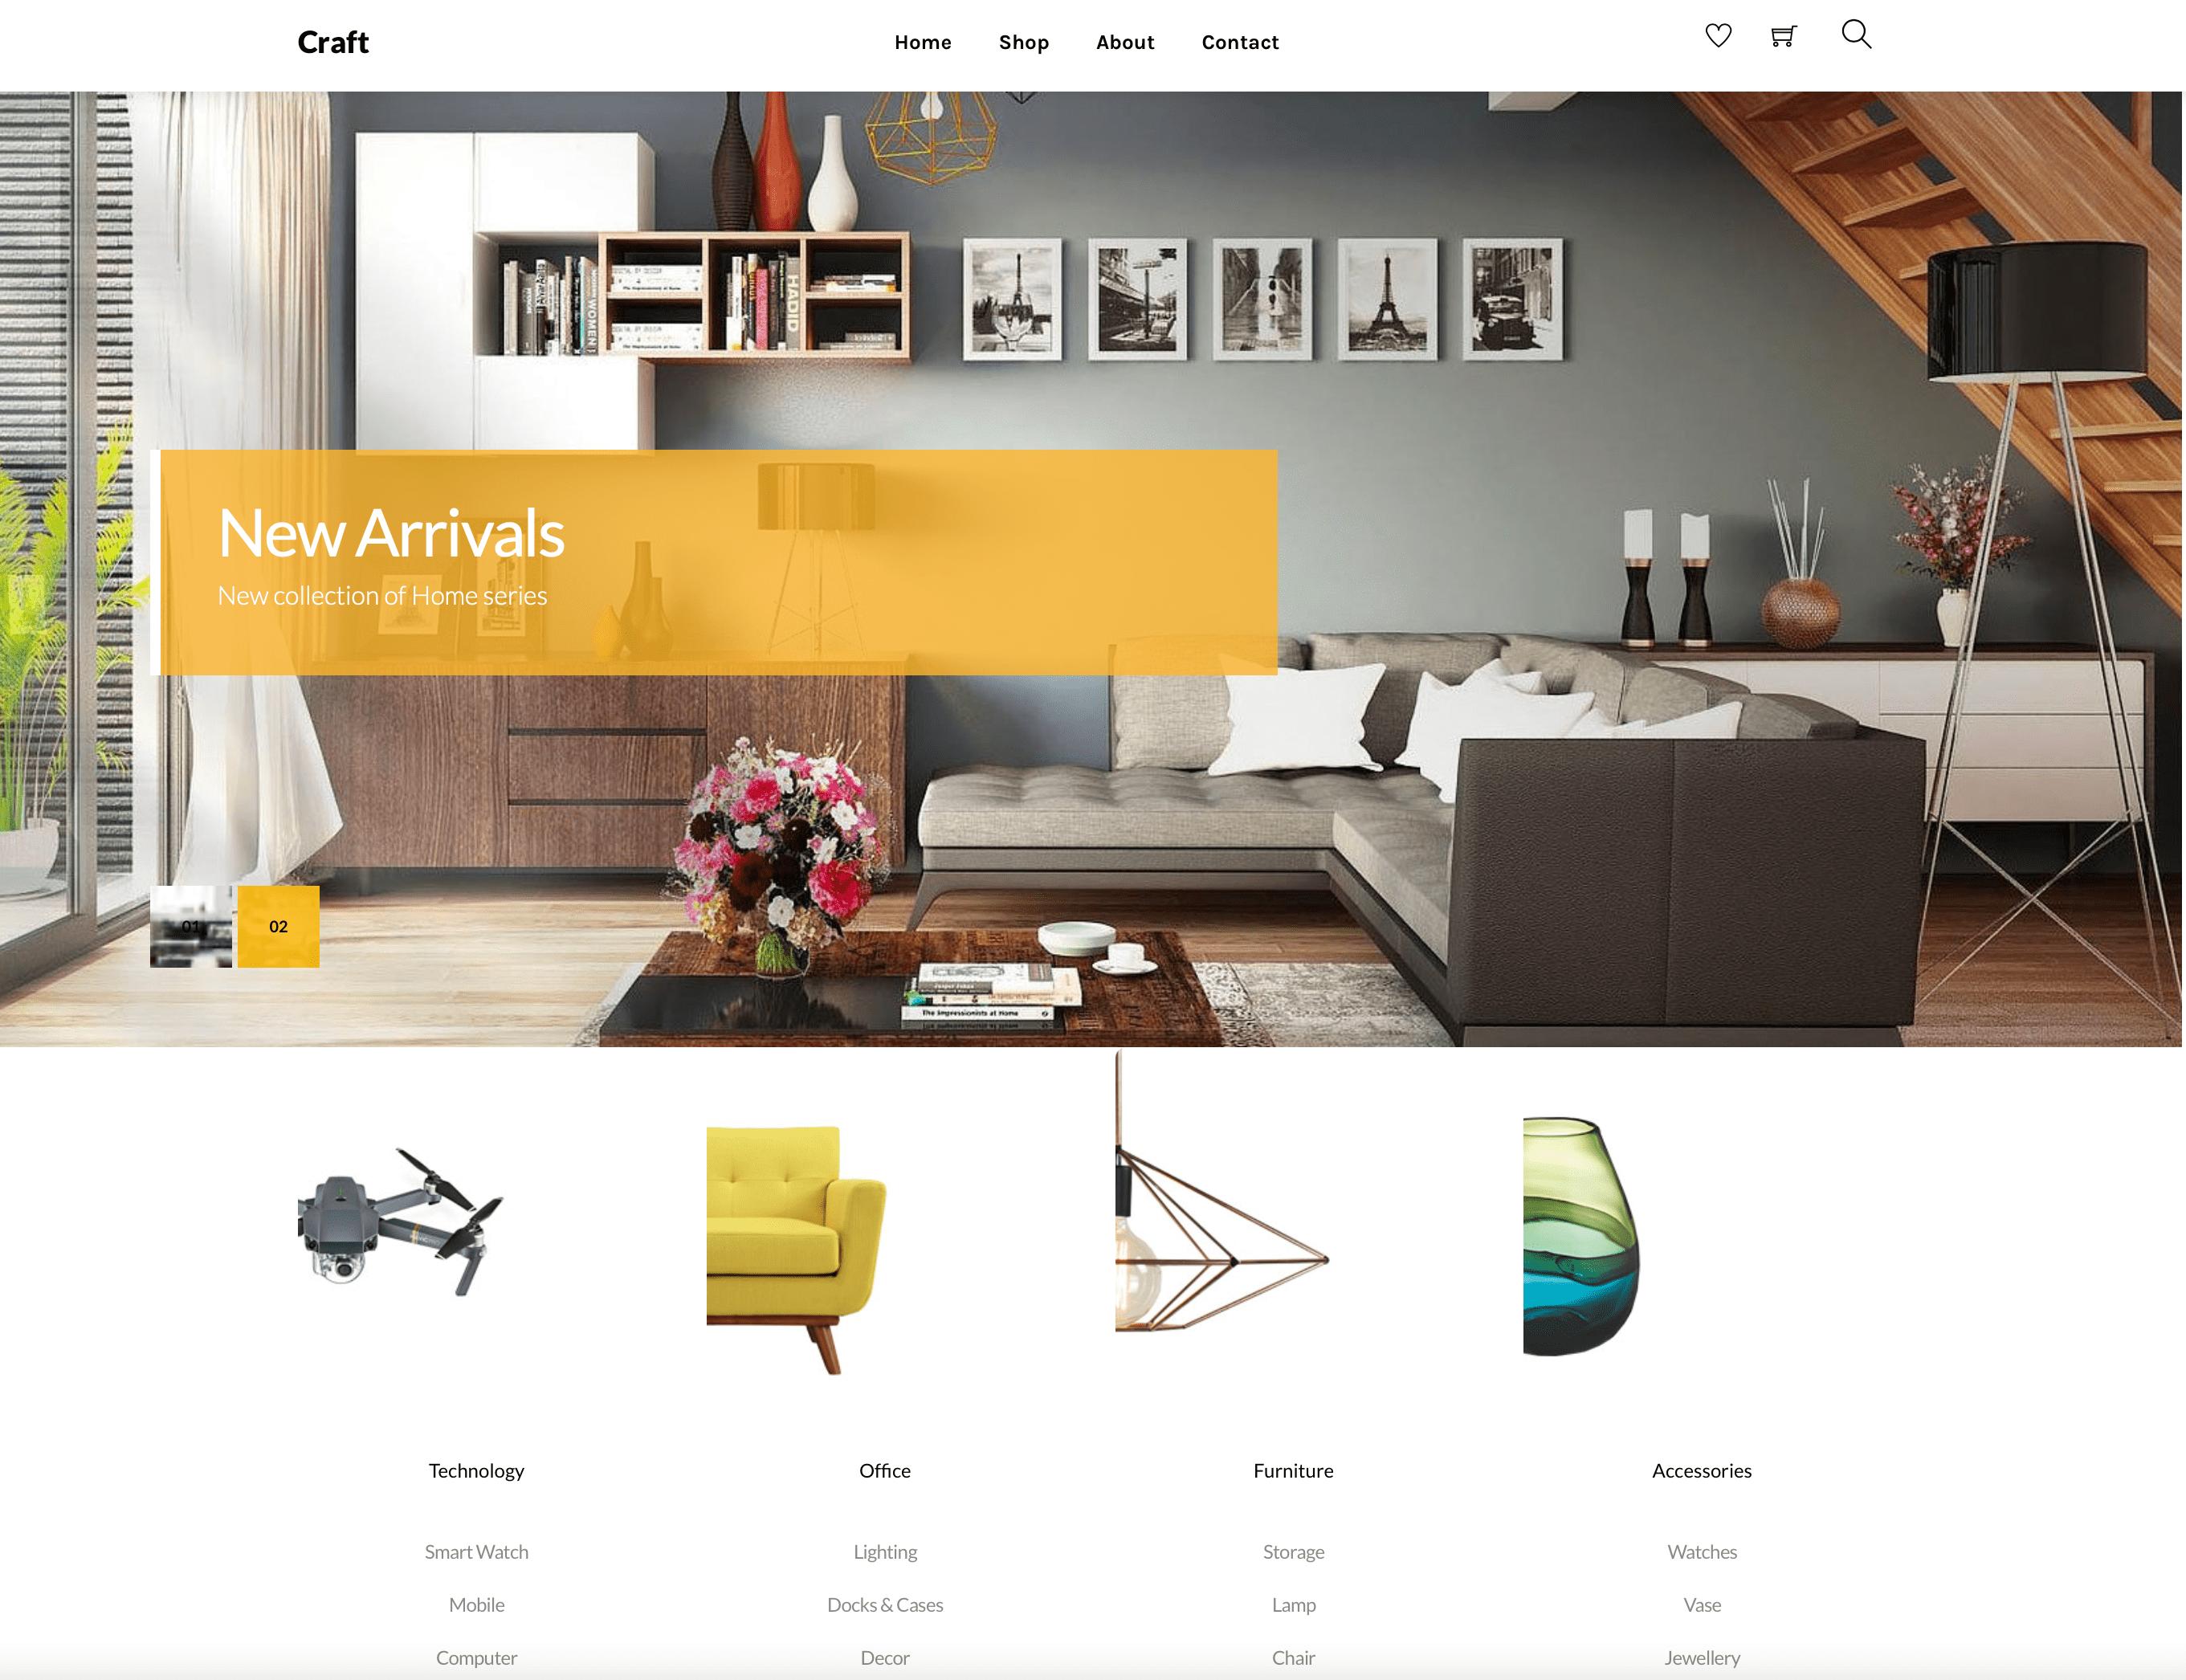 Furniture and Homeware Retailer website design